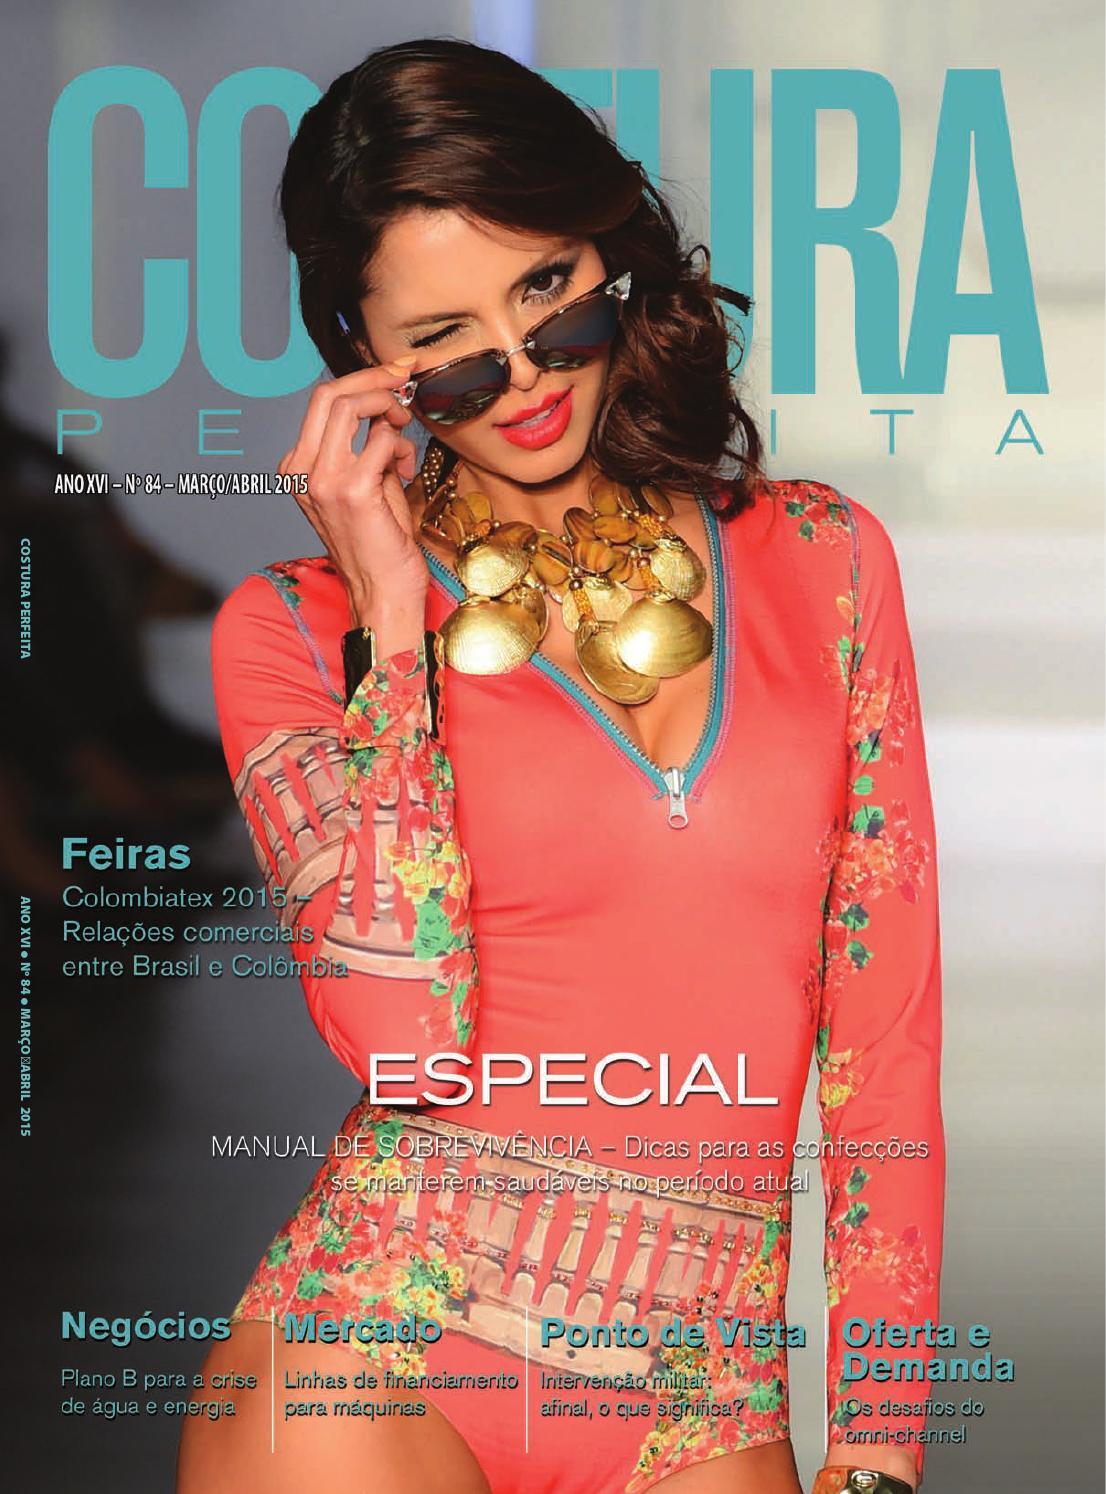 870c4bff8 Revista Costura Perfeita Ano XVI n°84 Marco/Abril 2015 by Costura Perfeita  - issuu